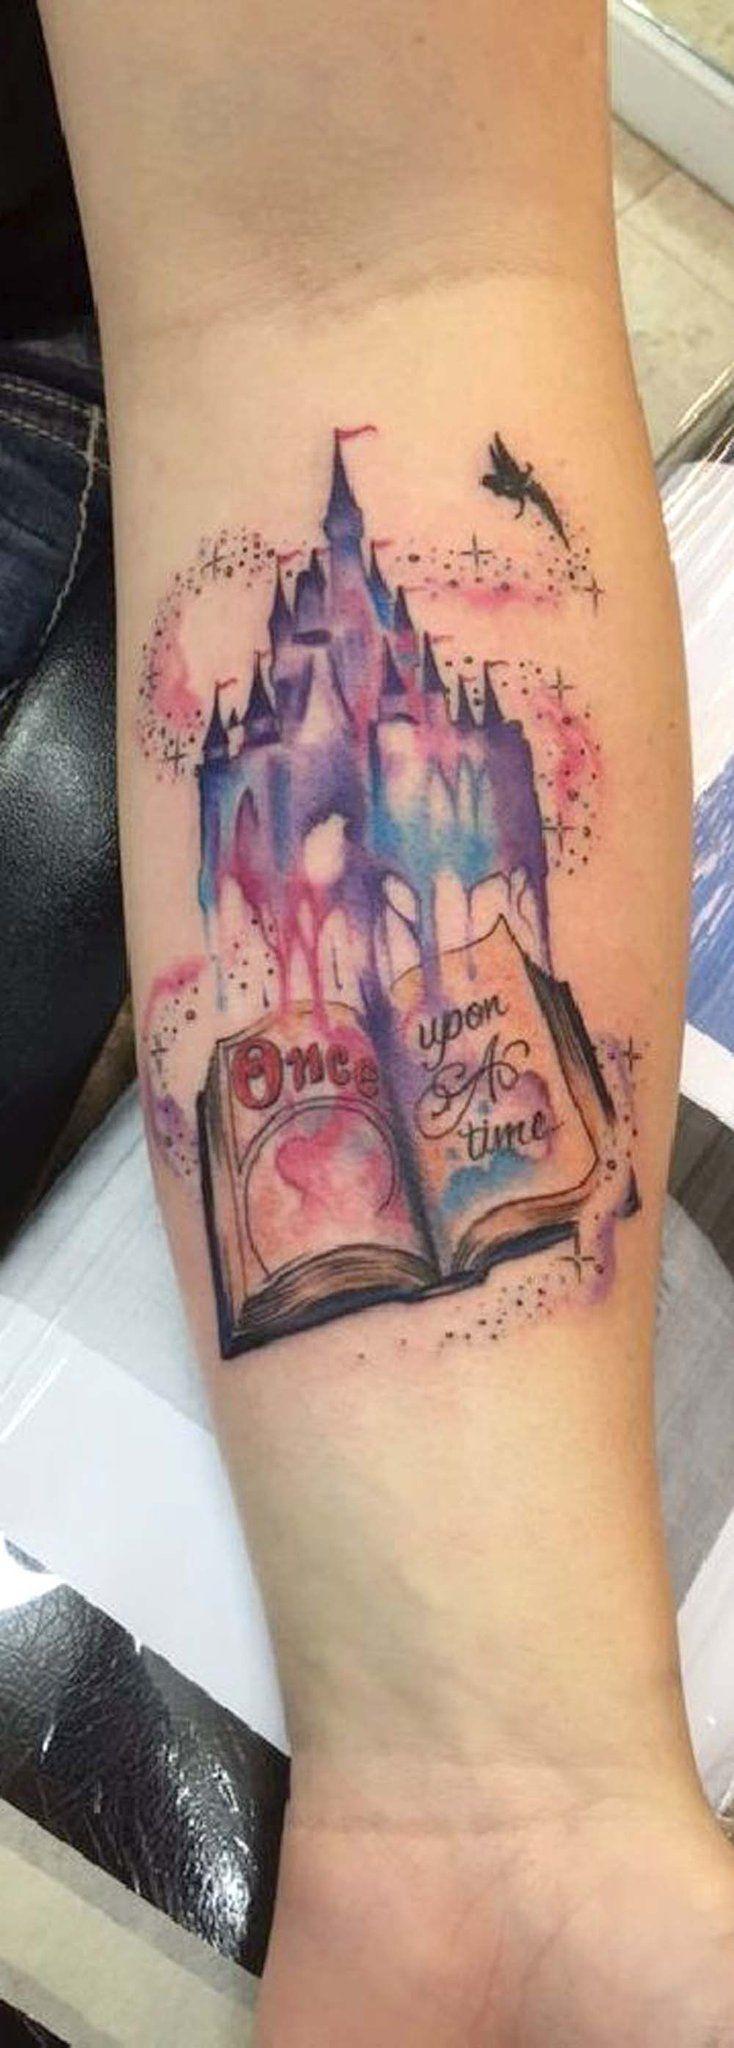 Disney Castle Watercolor Forearm Tattoo Ideas for Women Tinkerbell Fairy  -  ideas de tatuaje de antebrazo de castillo -  www.MyBodiArt.com